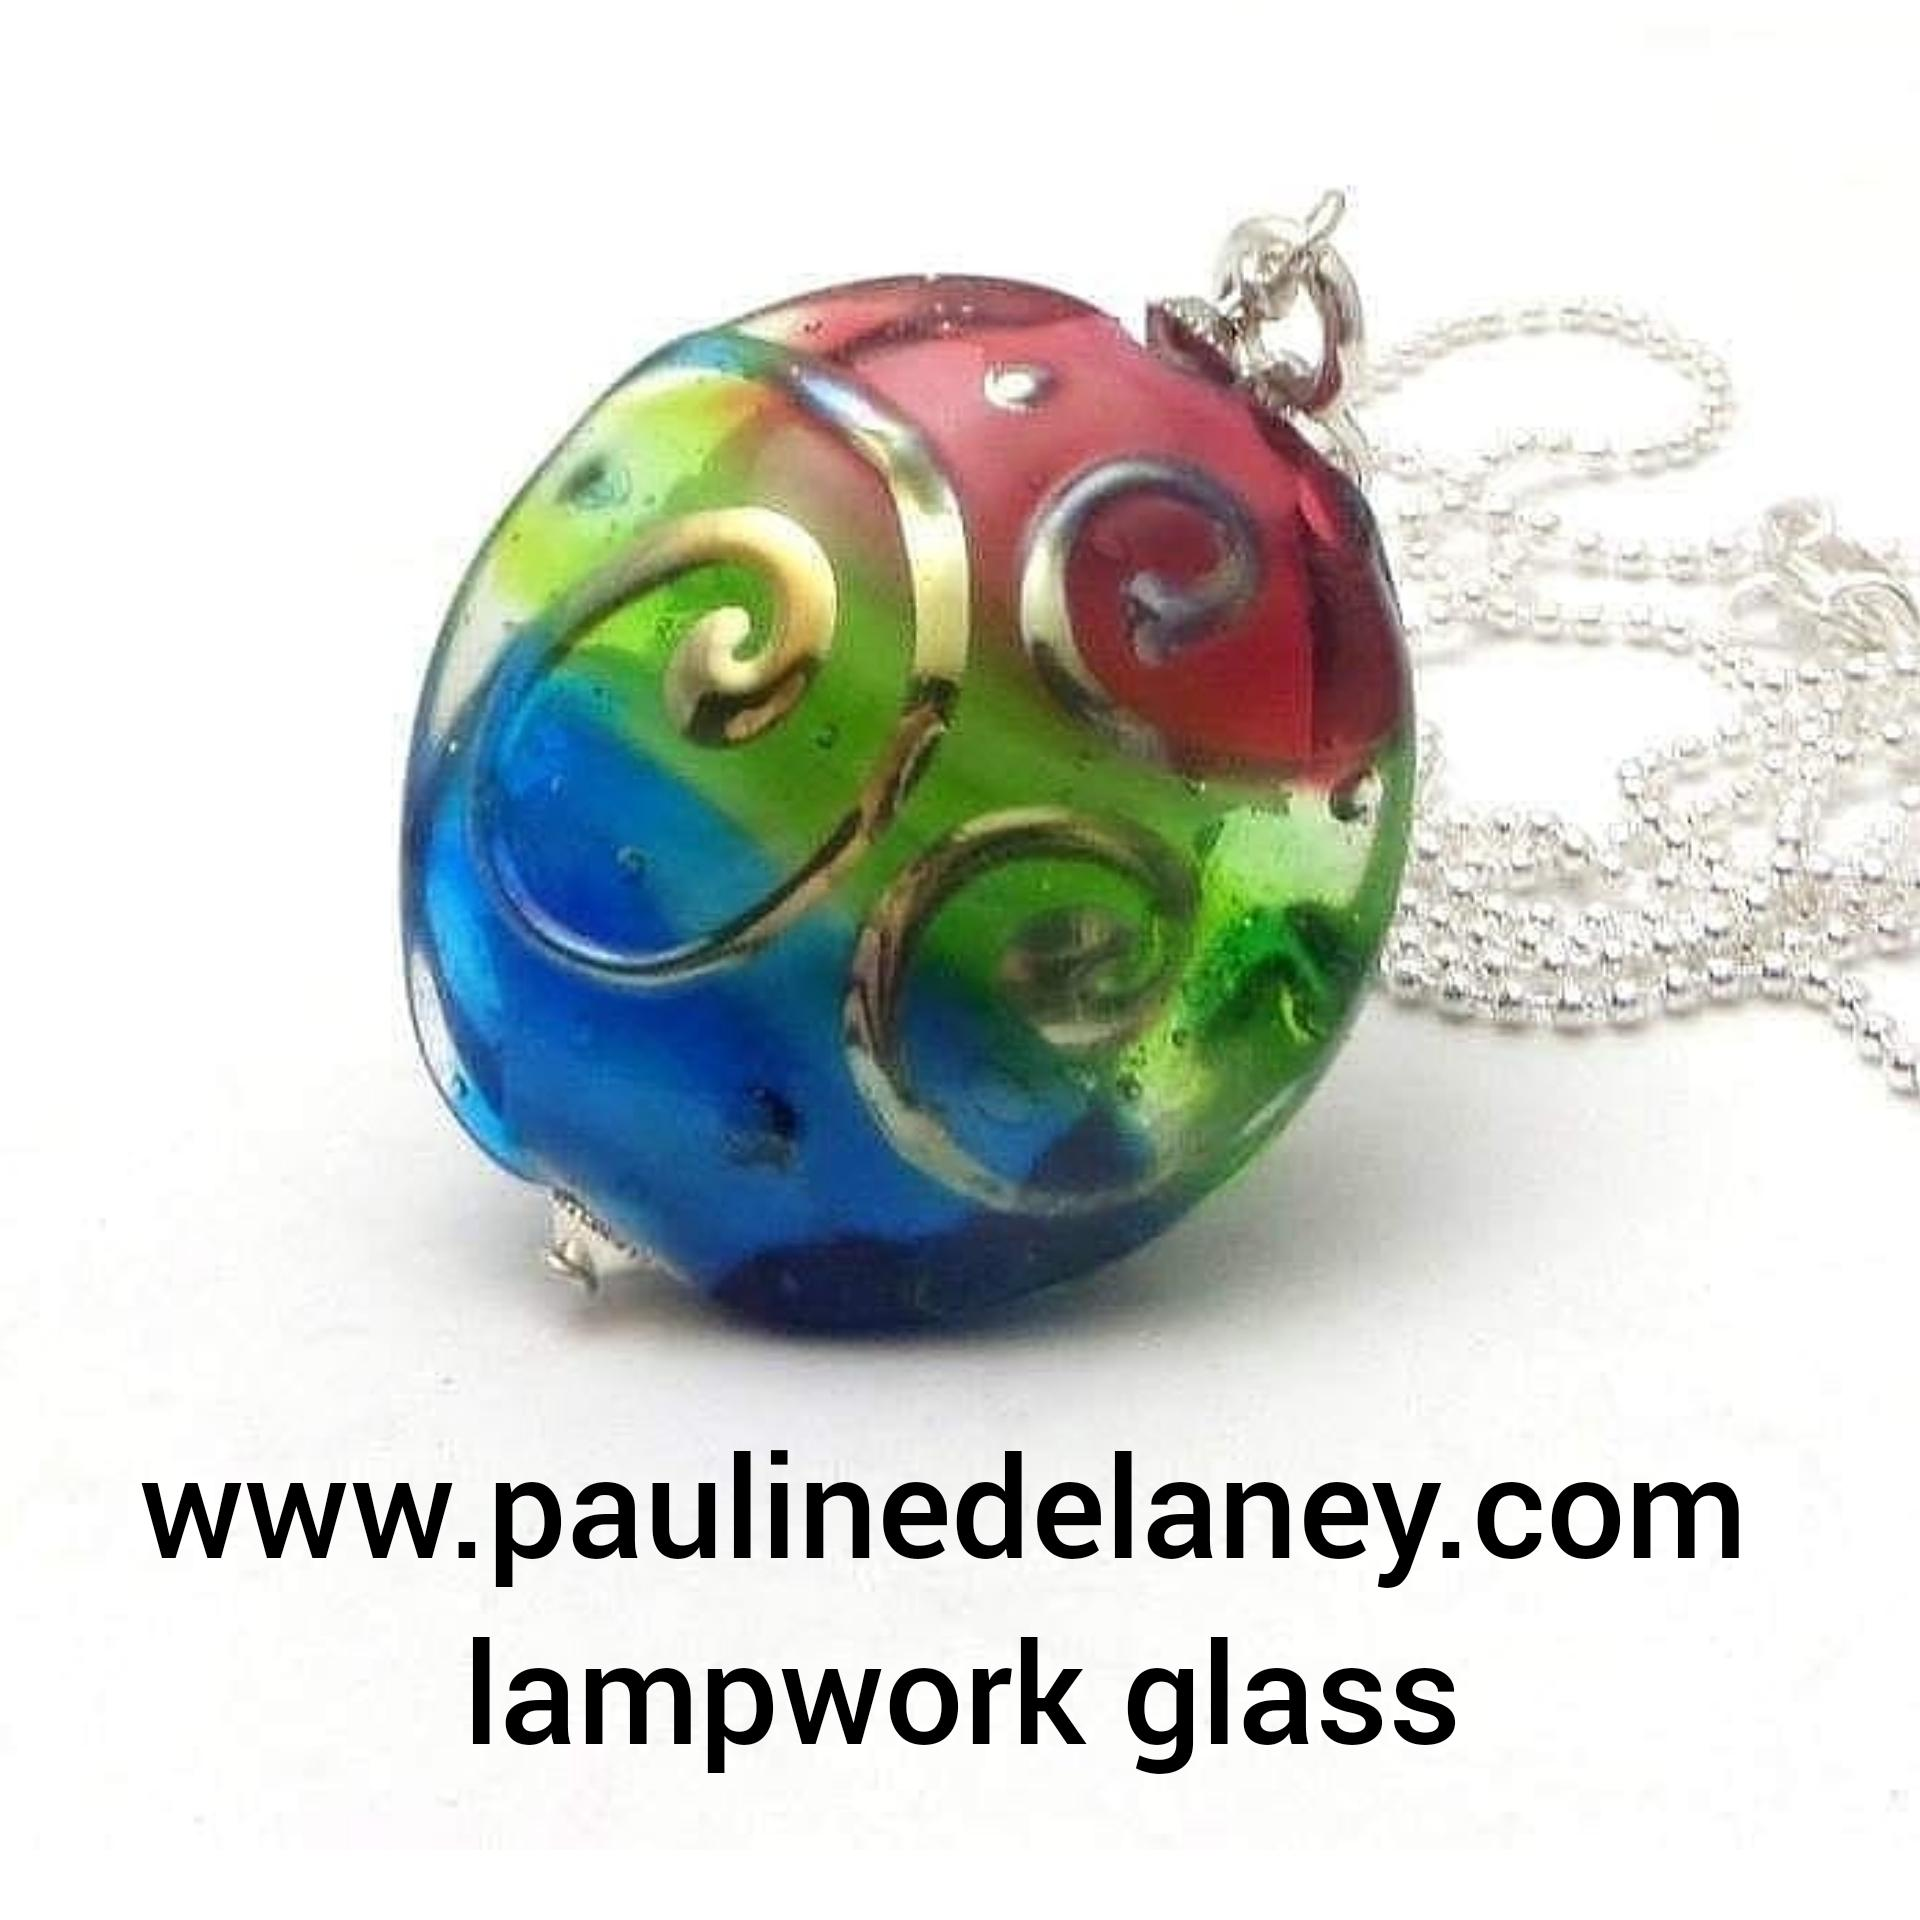 Pauline Delaney Logo